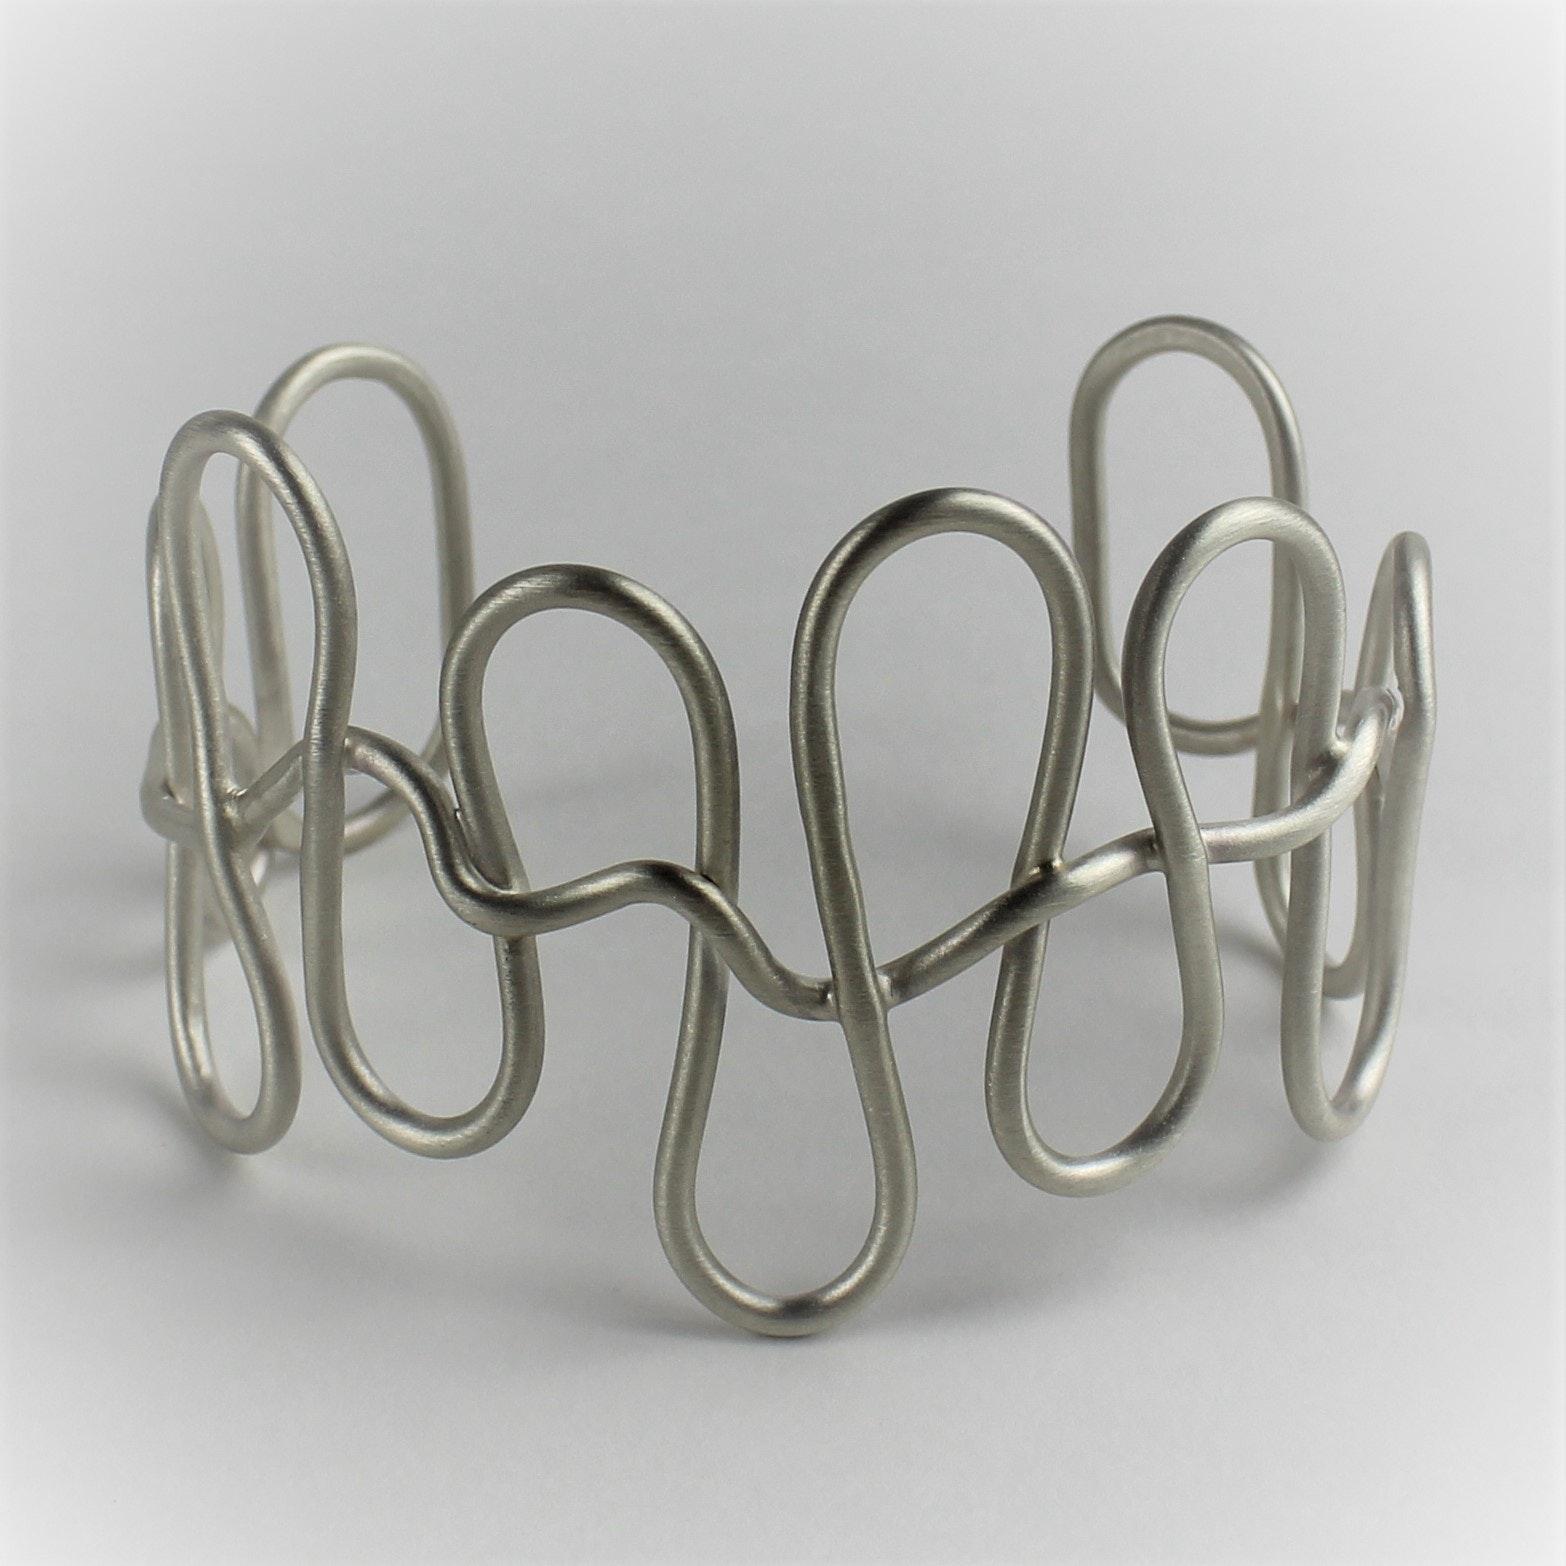 Artist Created Sterling Silver Cuff Bracelet